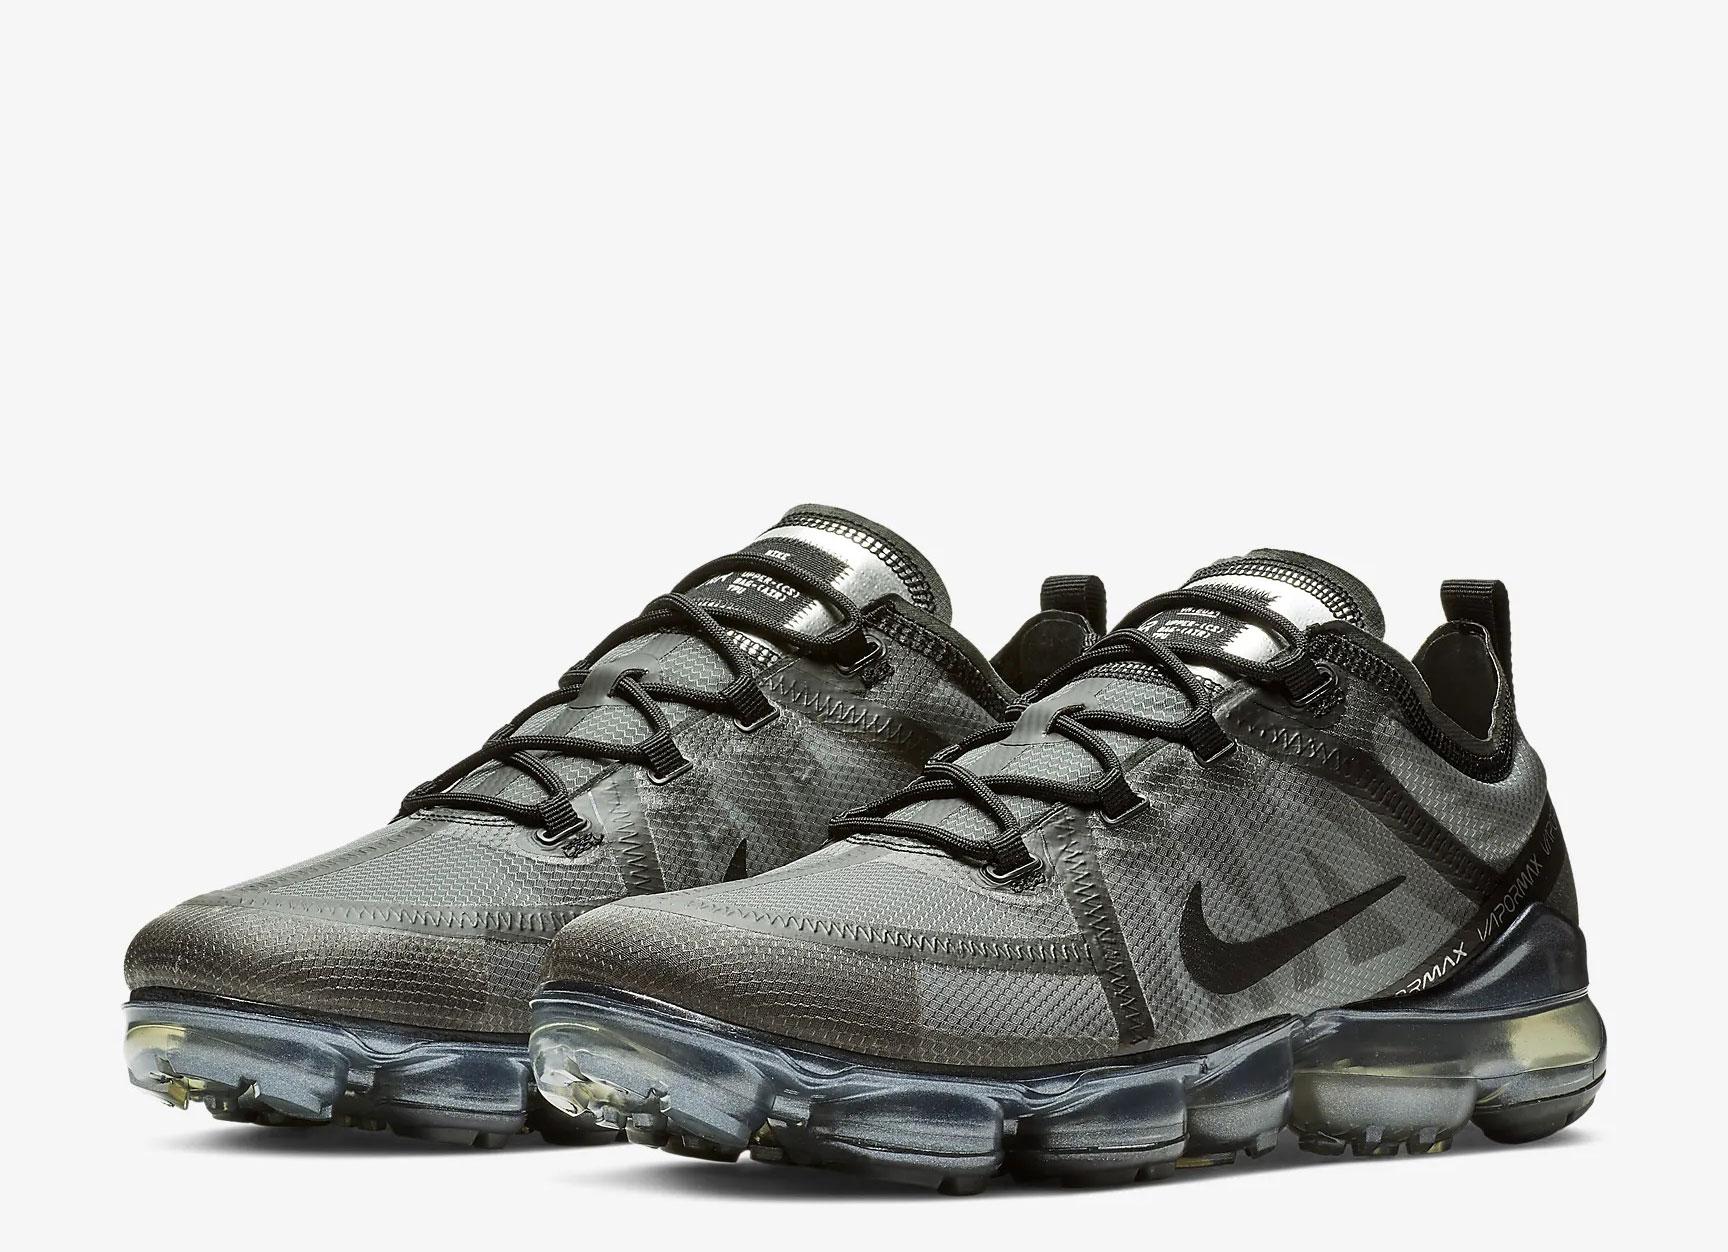 Nike Air VaporMax 2019 heren sneakers donkergrijs